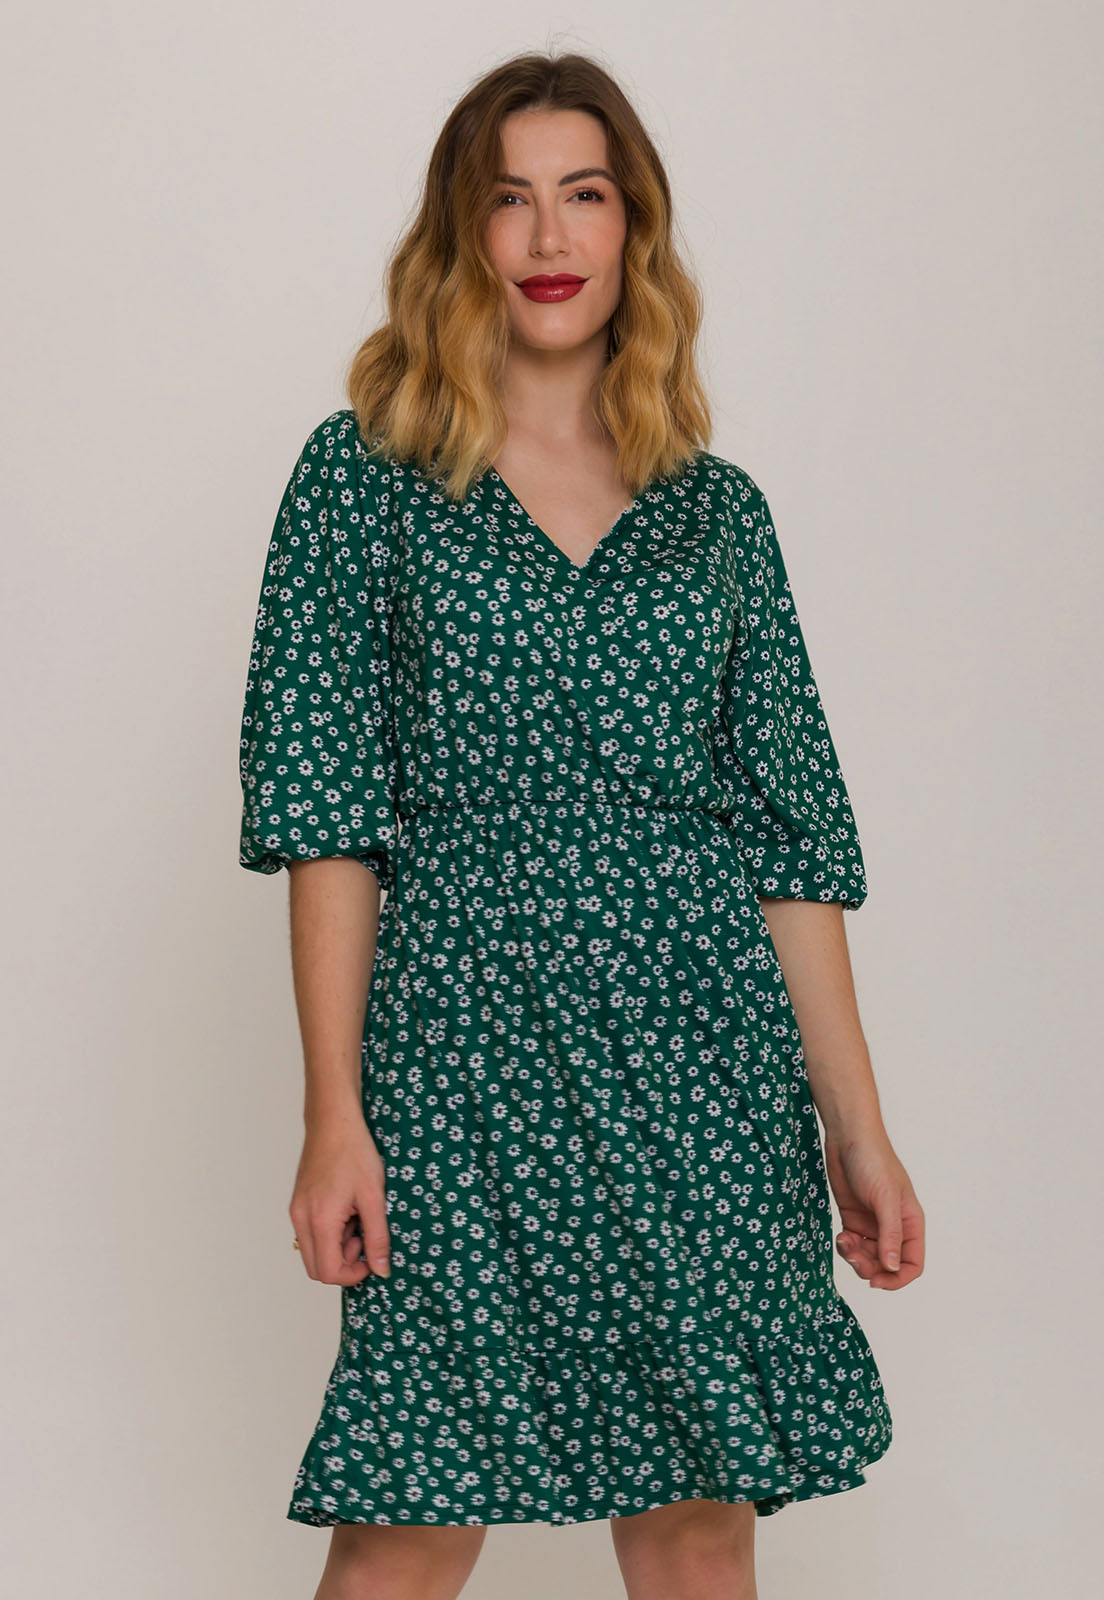 Vestido Transpassado Floral Verde